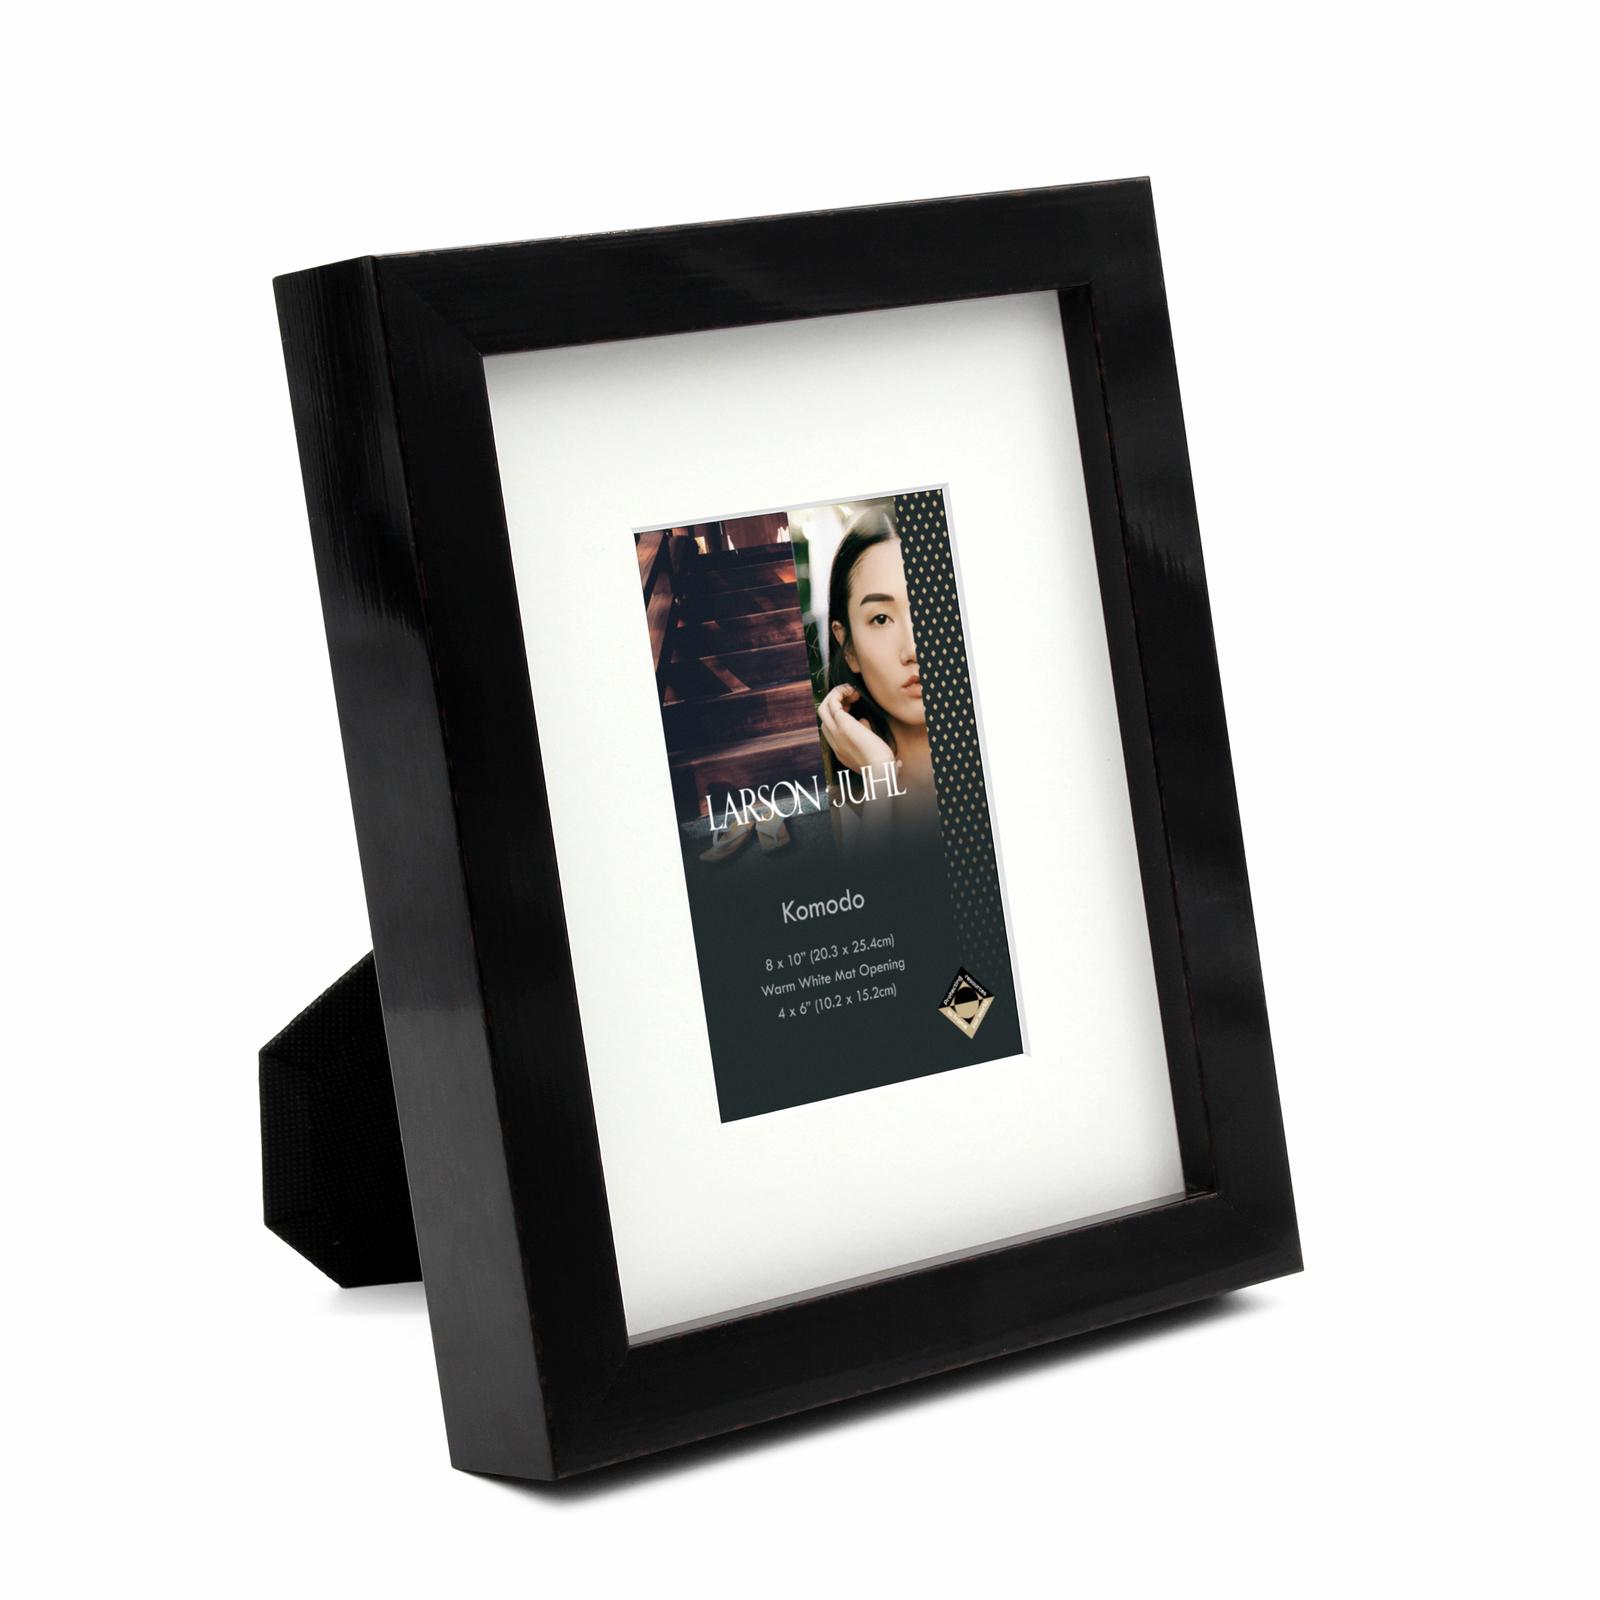 Komodo 8 x 10inch/4 x 6inch Opening Black Photo Frame